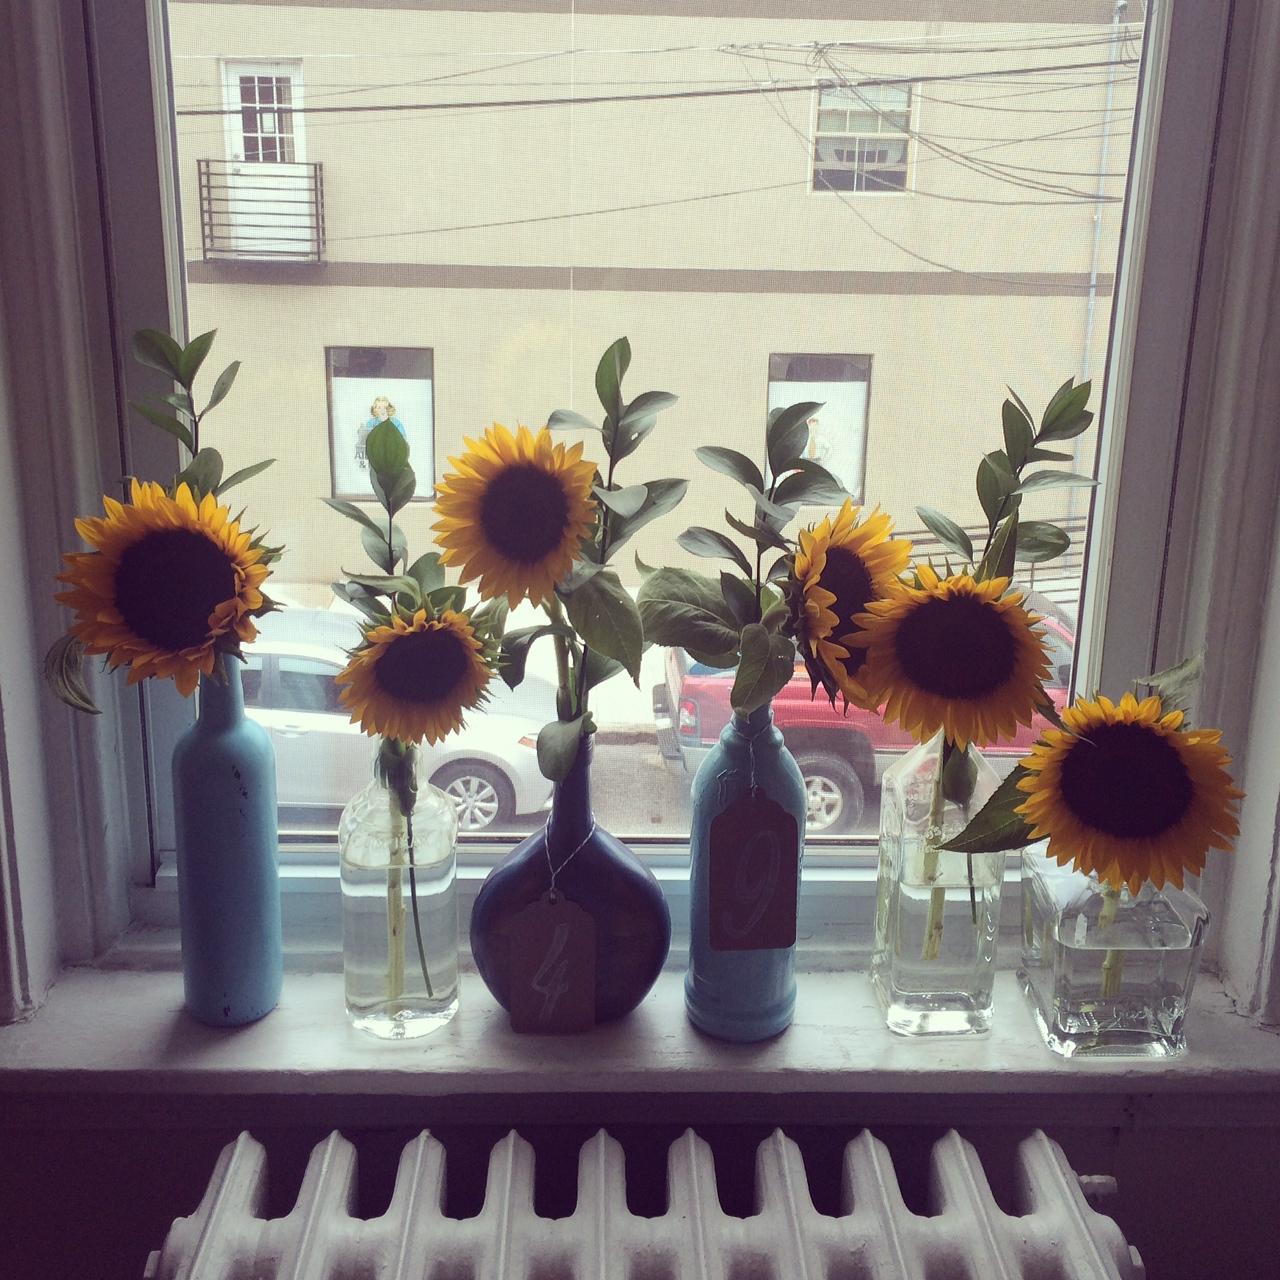 Sunflowers, portable gardening, garden trends